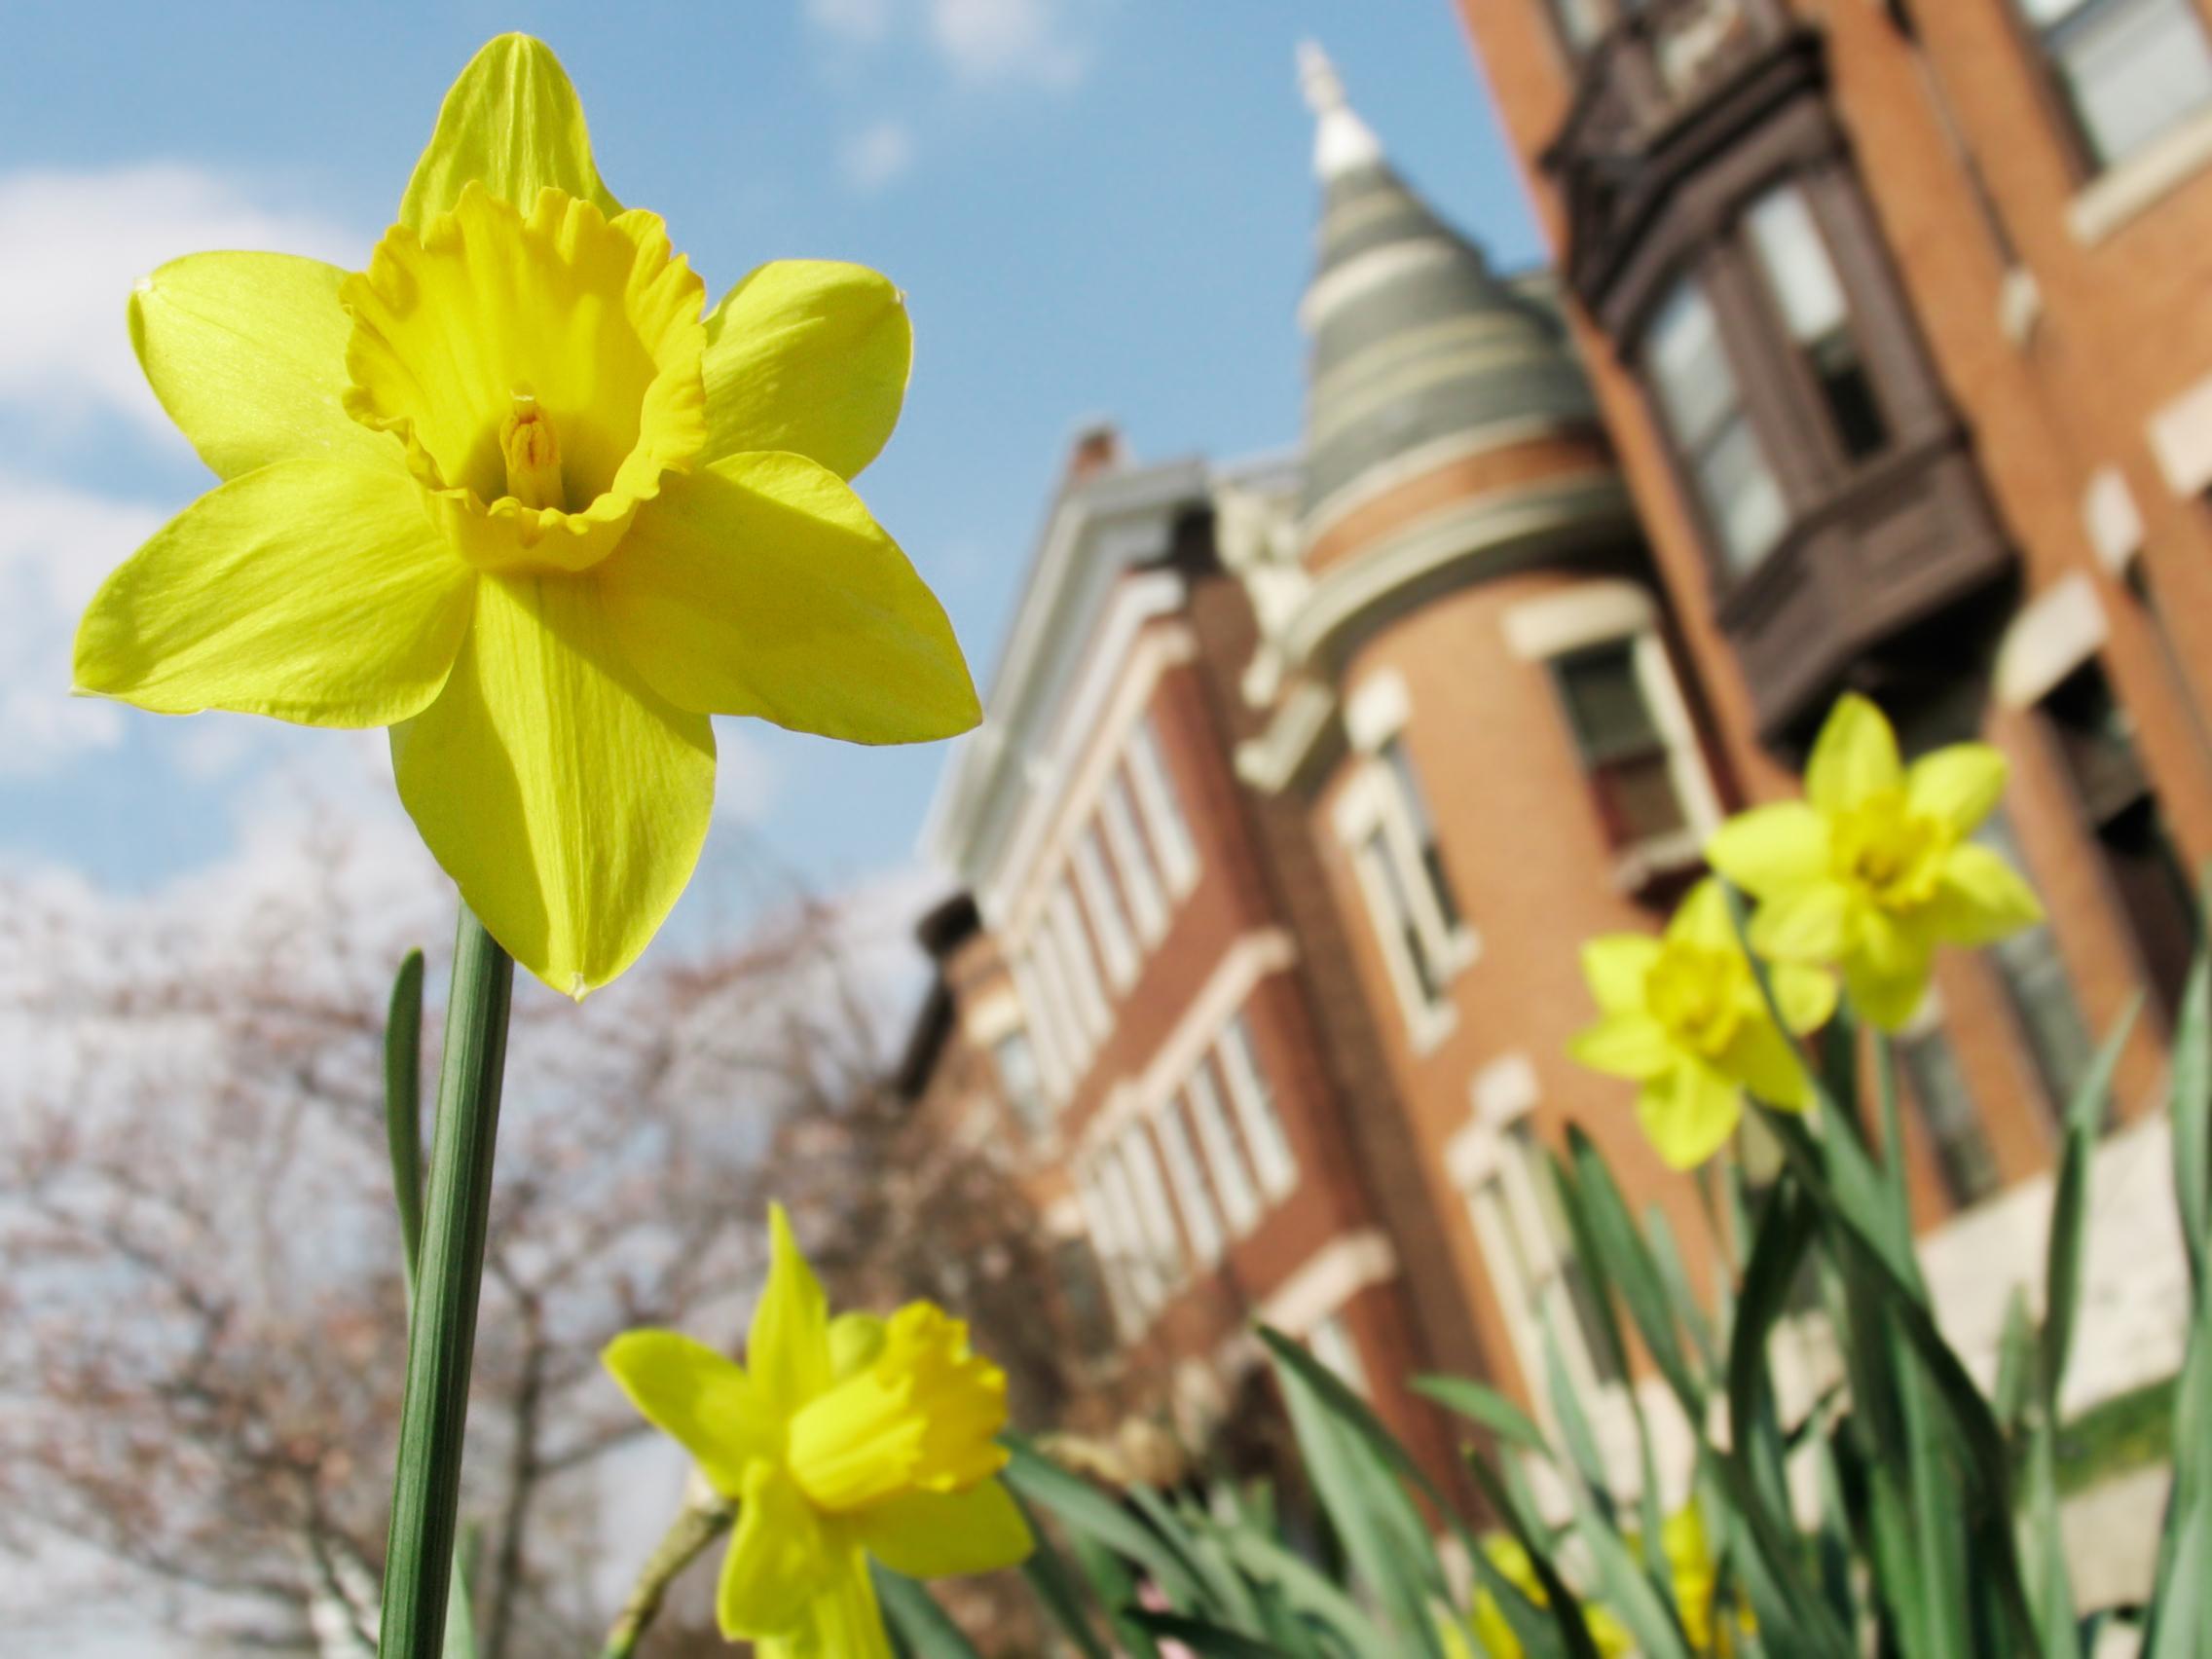 Visit Maryland Spring 2020 - International Law